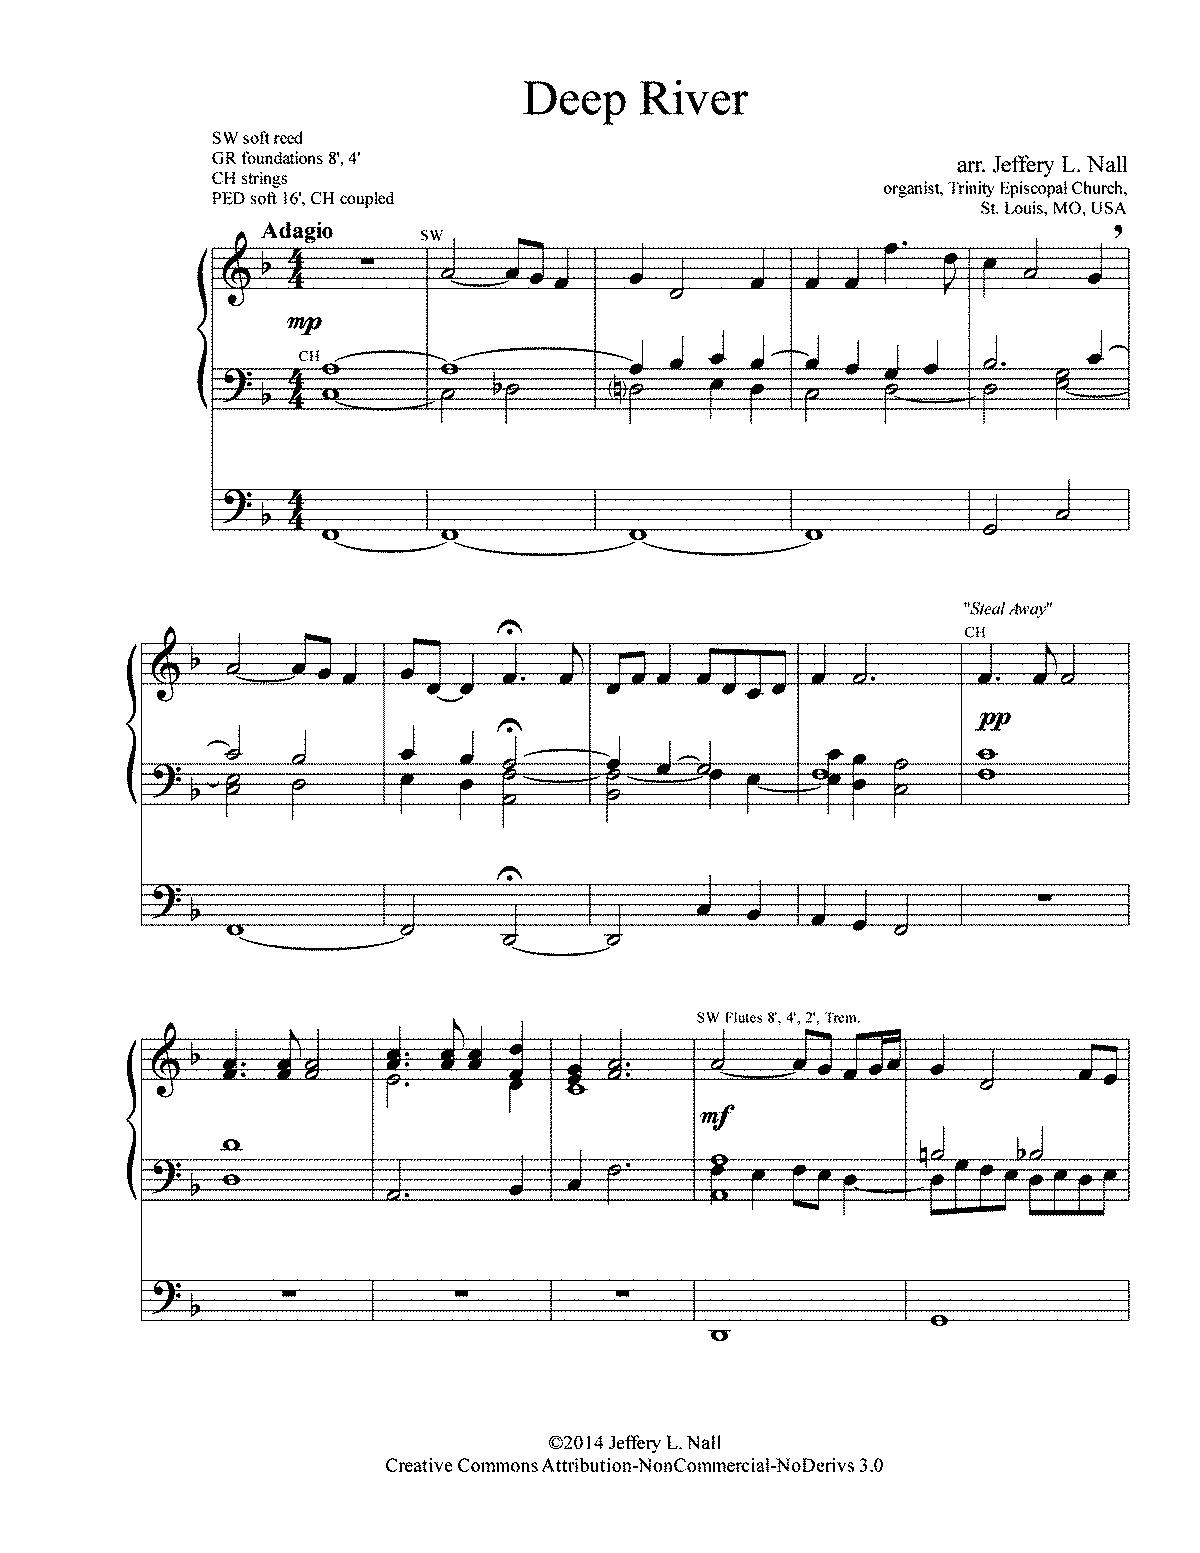 Deep river sheet music pdf